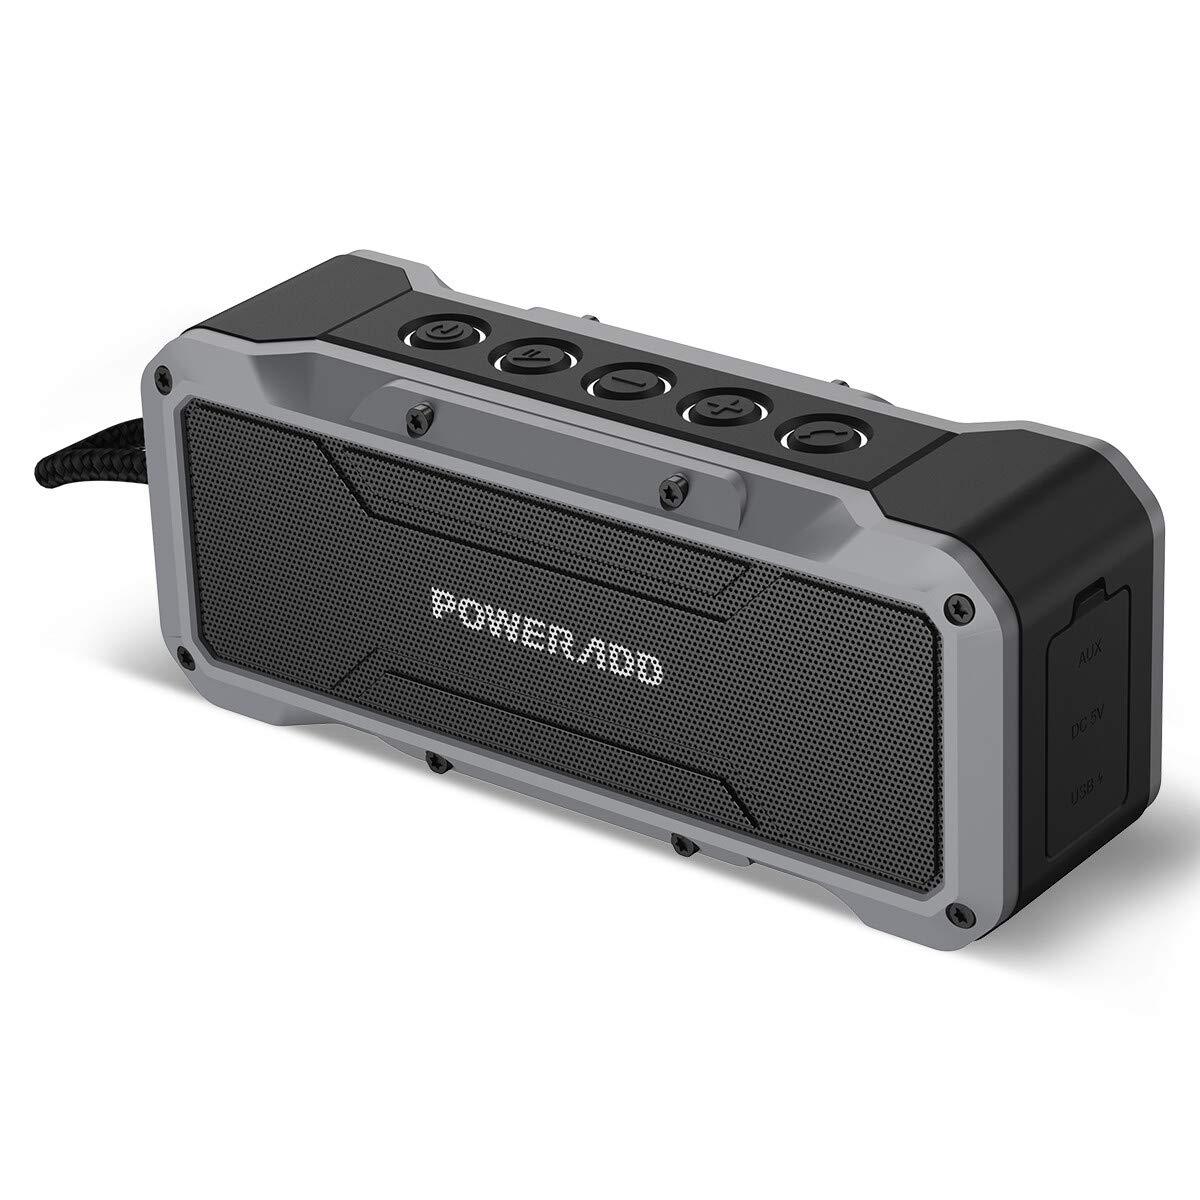 POWERADD Bluetooth Lautsprecher mit 4 StereoTreibern (2X13W+2x5W) Wasserdicht IPX7 tragbare Lautsprecher Außen Bluetooth 4.2/AUX Lautsprecher mit 4000mAh Powerbank